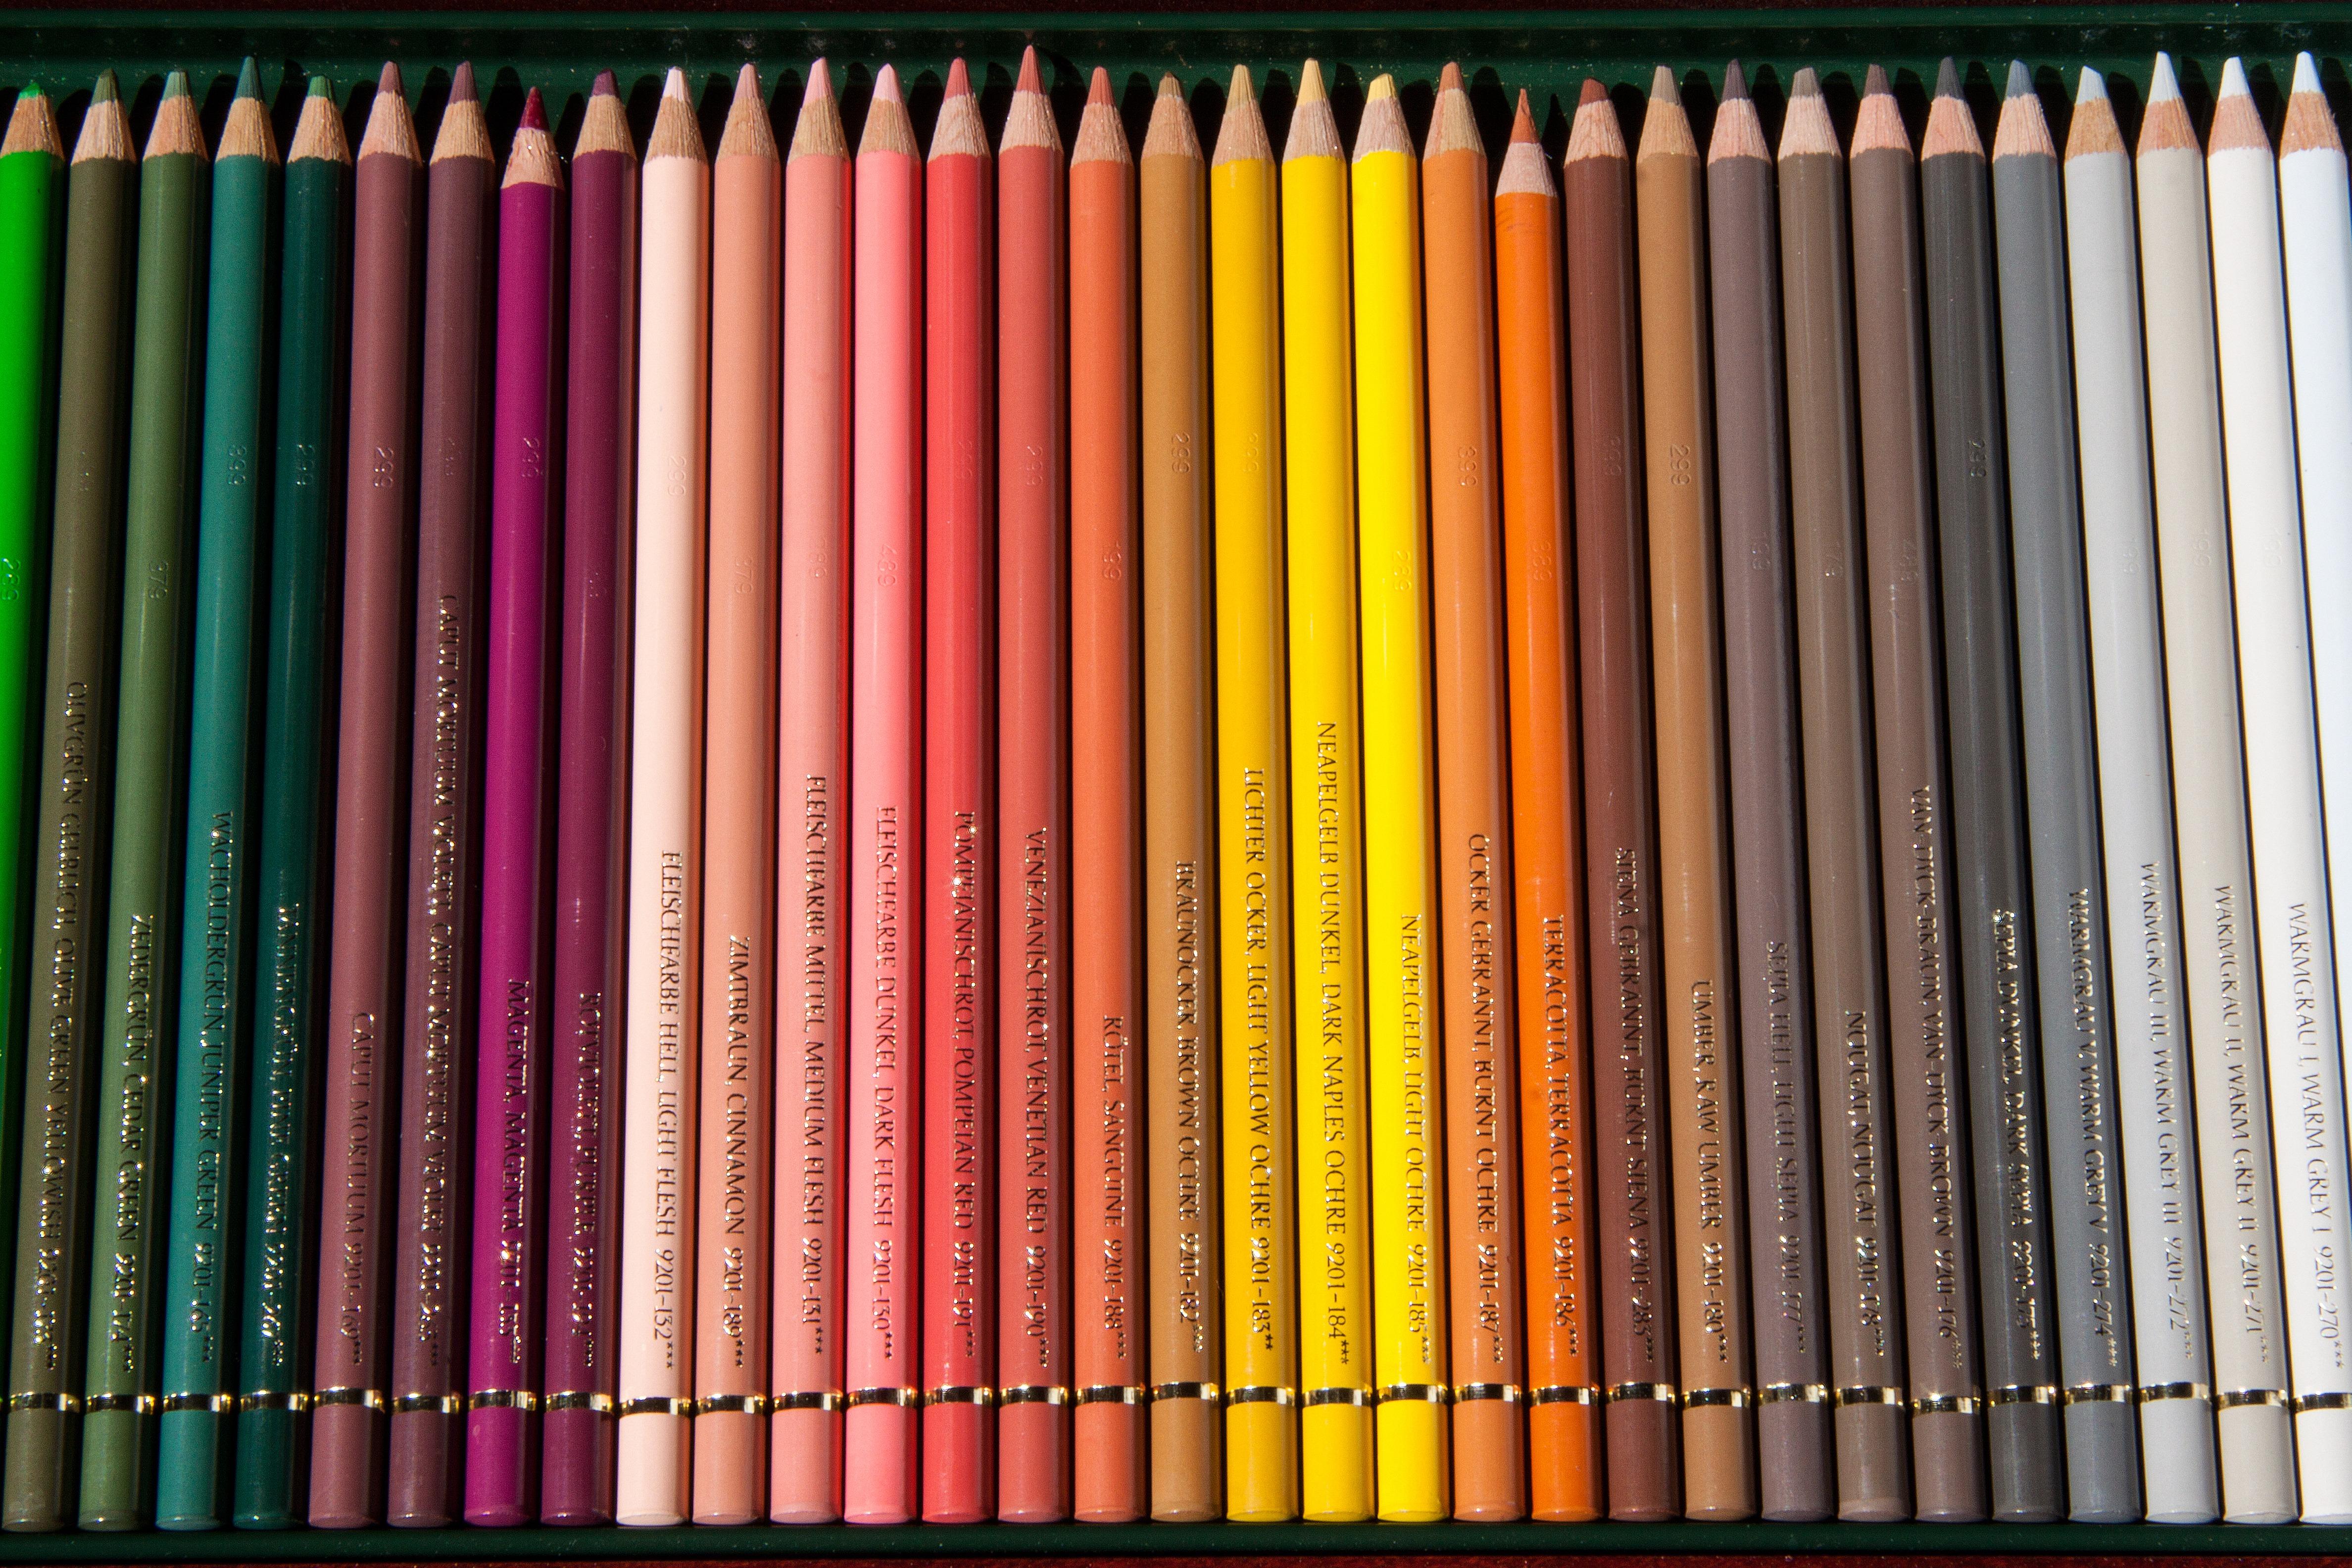 fotos gratis lpiz patrn lnea color vistoso material diseo de interiores textil bosquejo dibujar salir puntiagudo lpices de colores